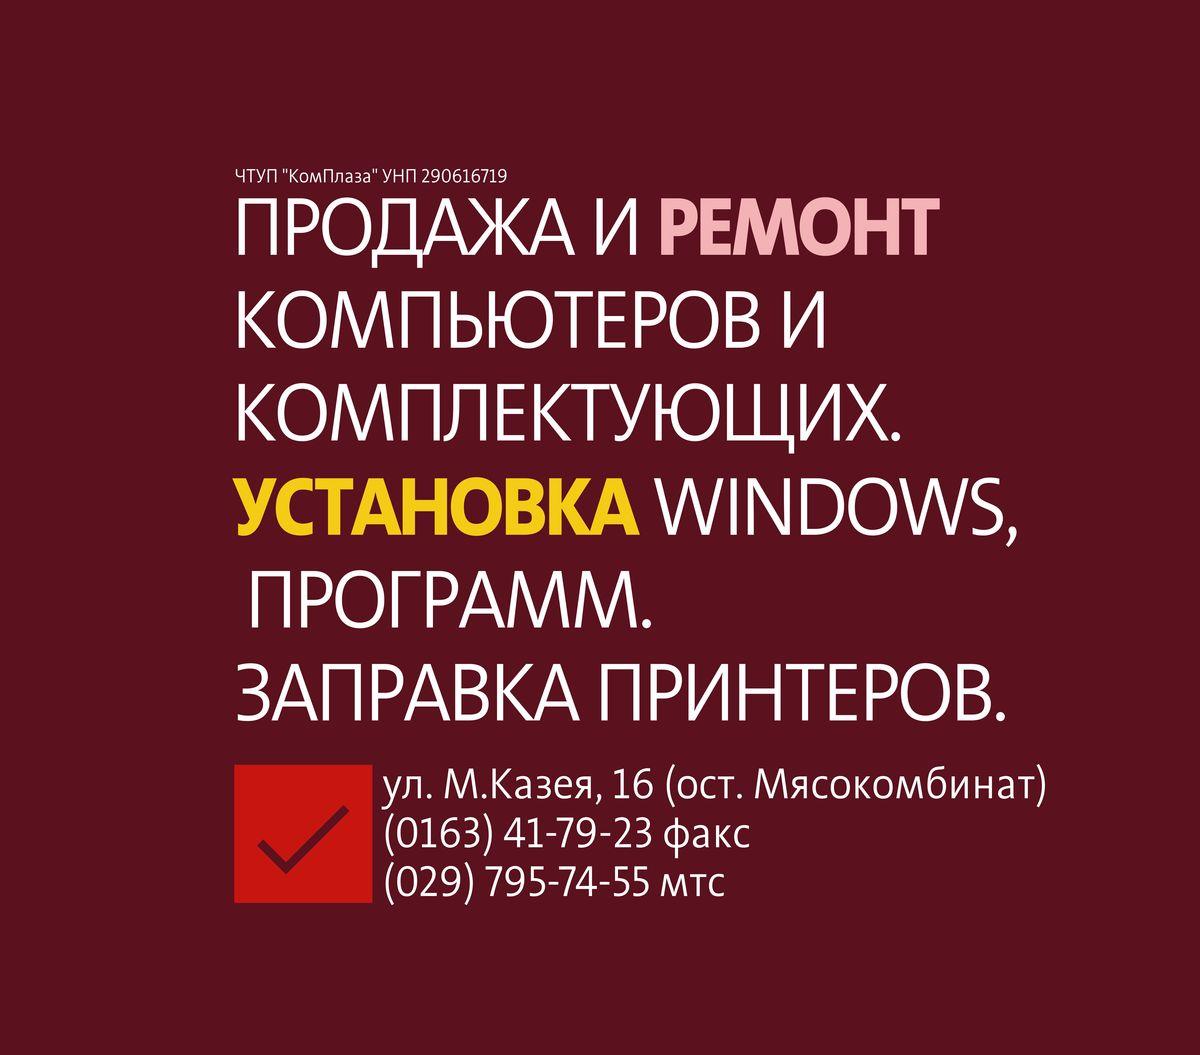 baner-sajt-pod-statyoj3